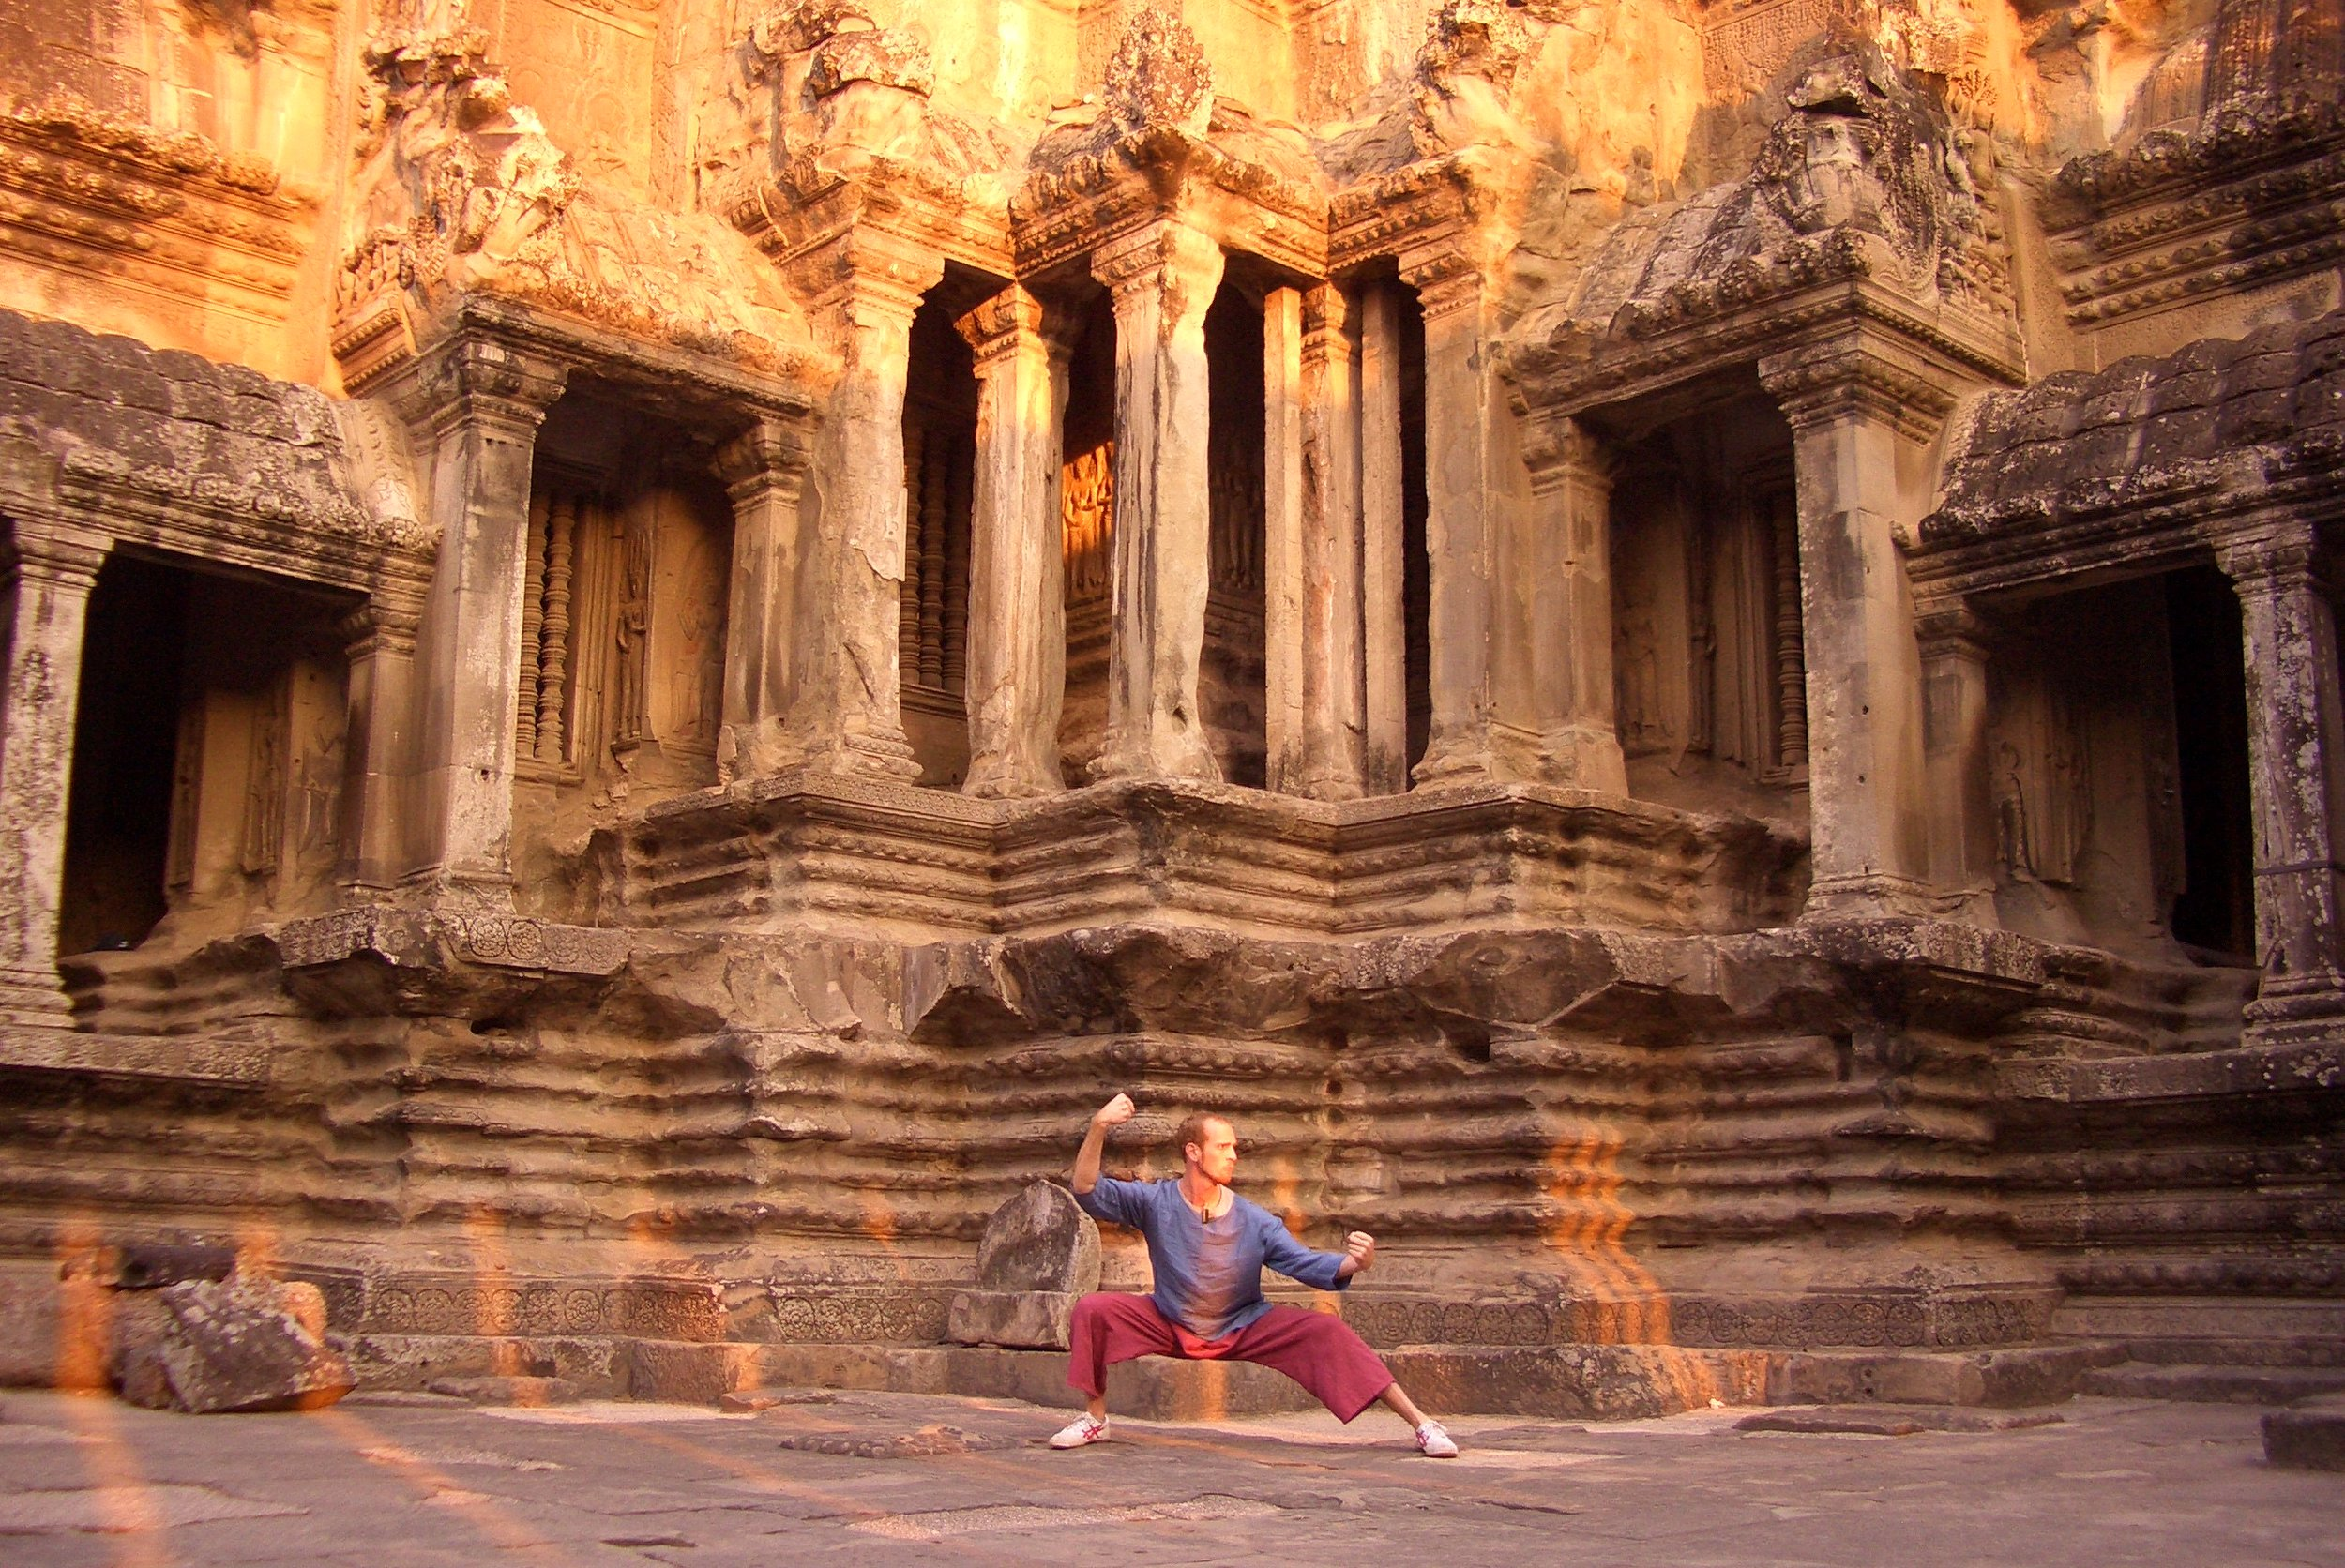 Sunrise Taiji practice (Angkor Wat, Cambodia)